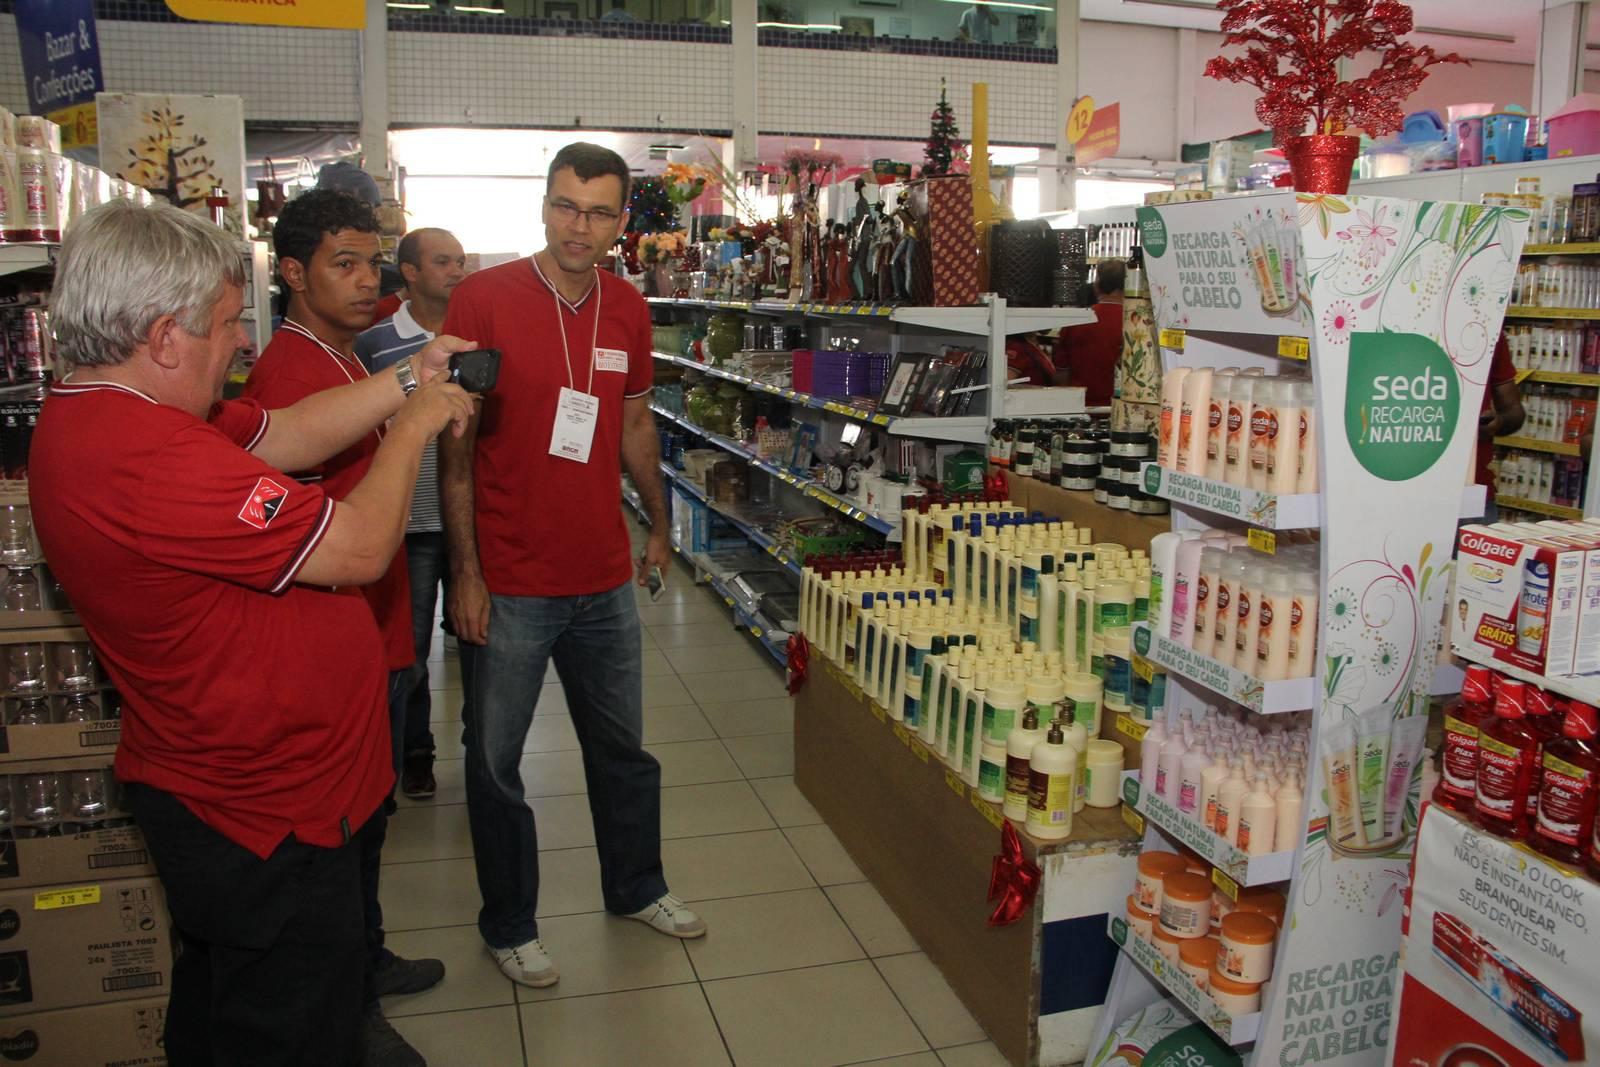 IV Encontro Regional do Nordeste - Bio Extratus (150)